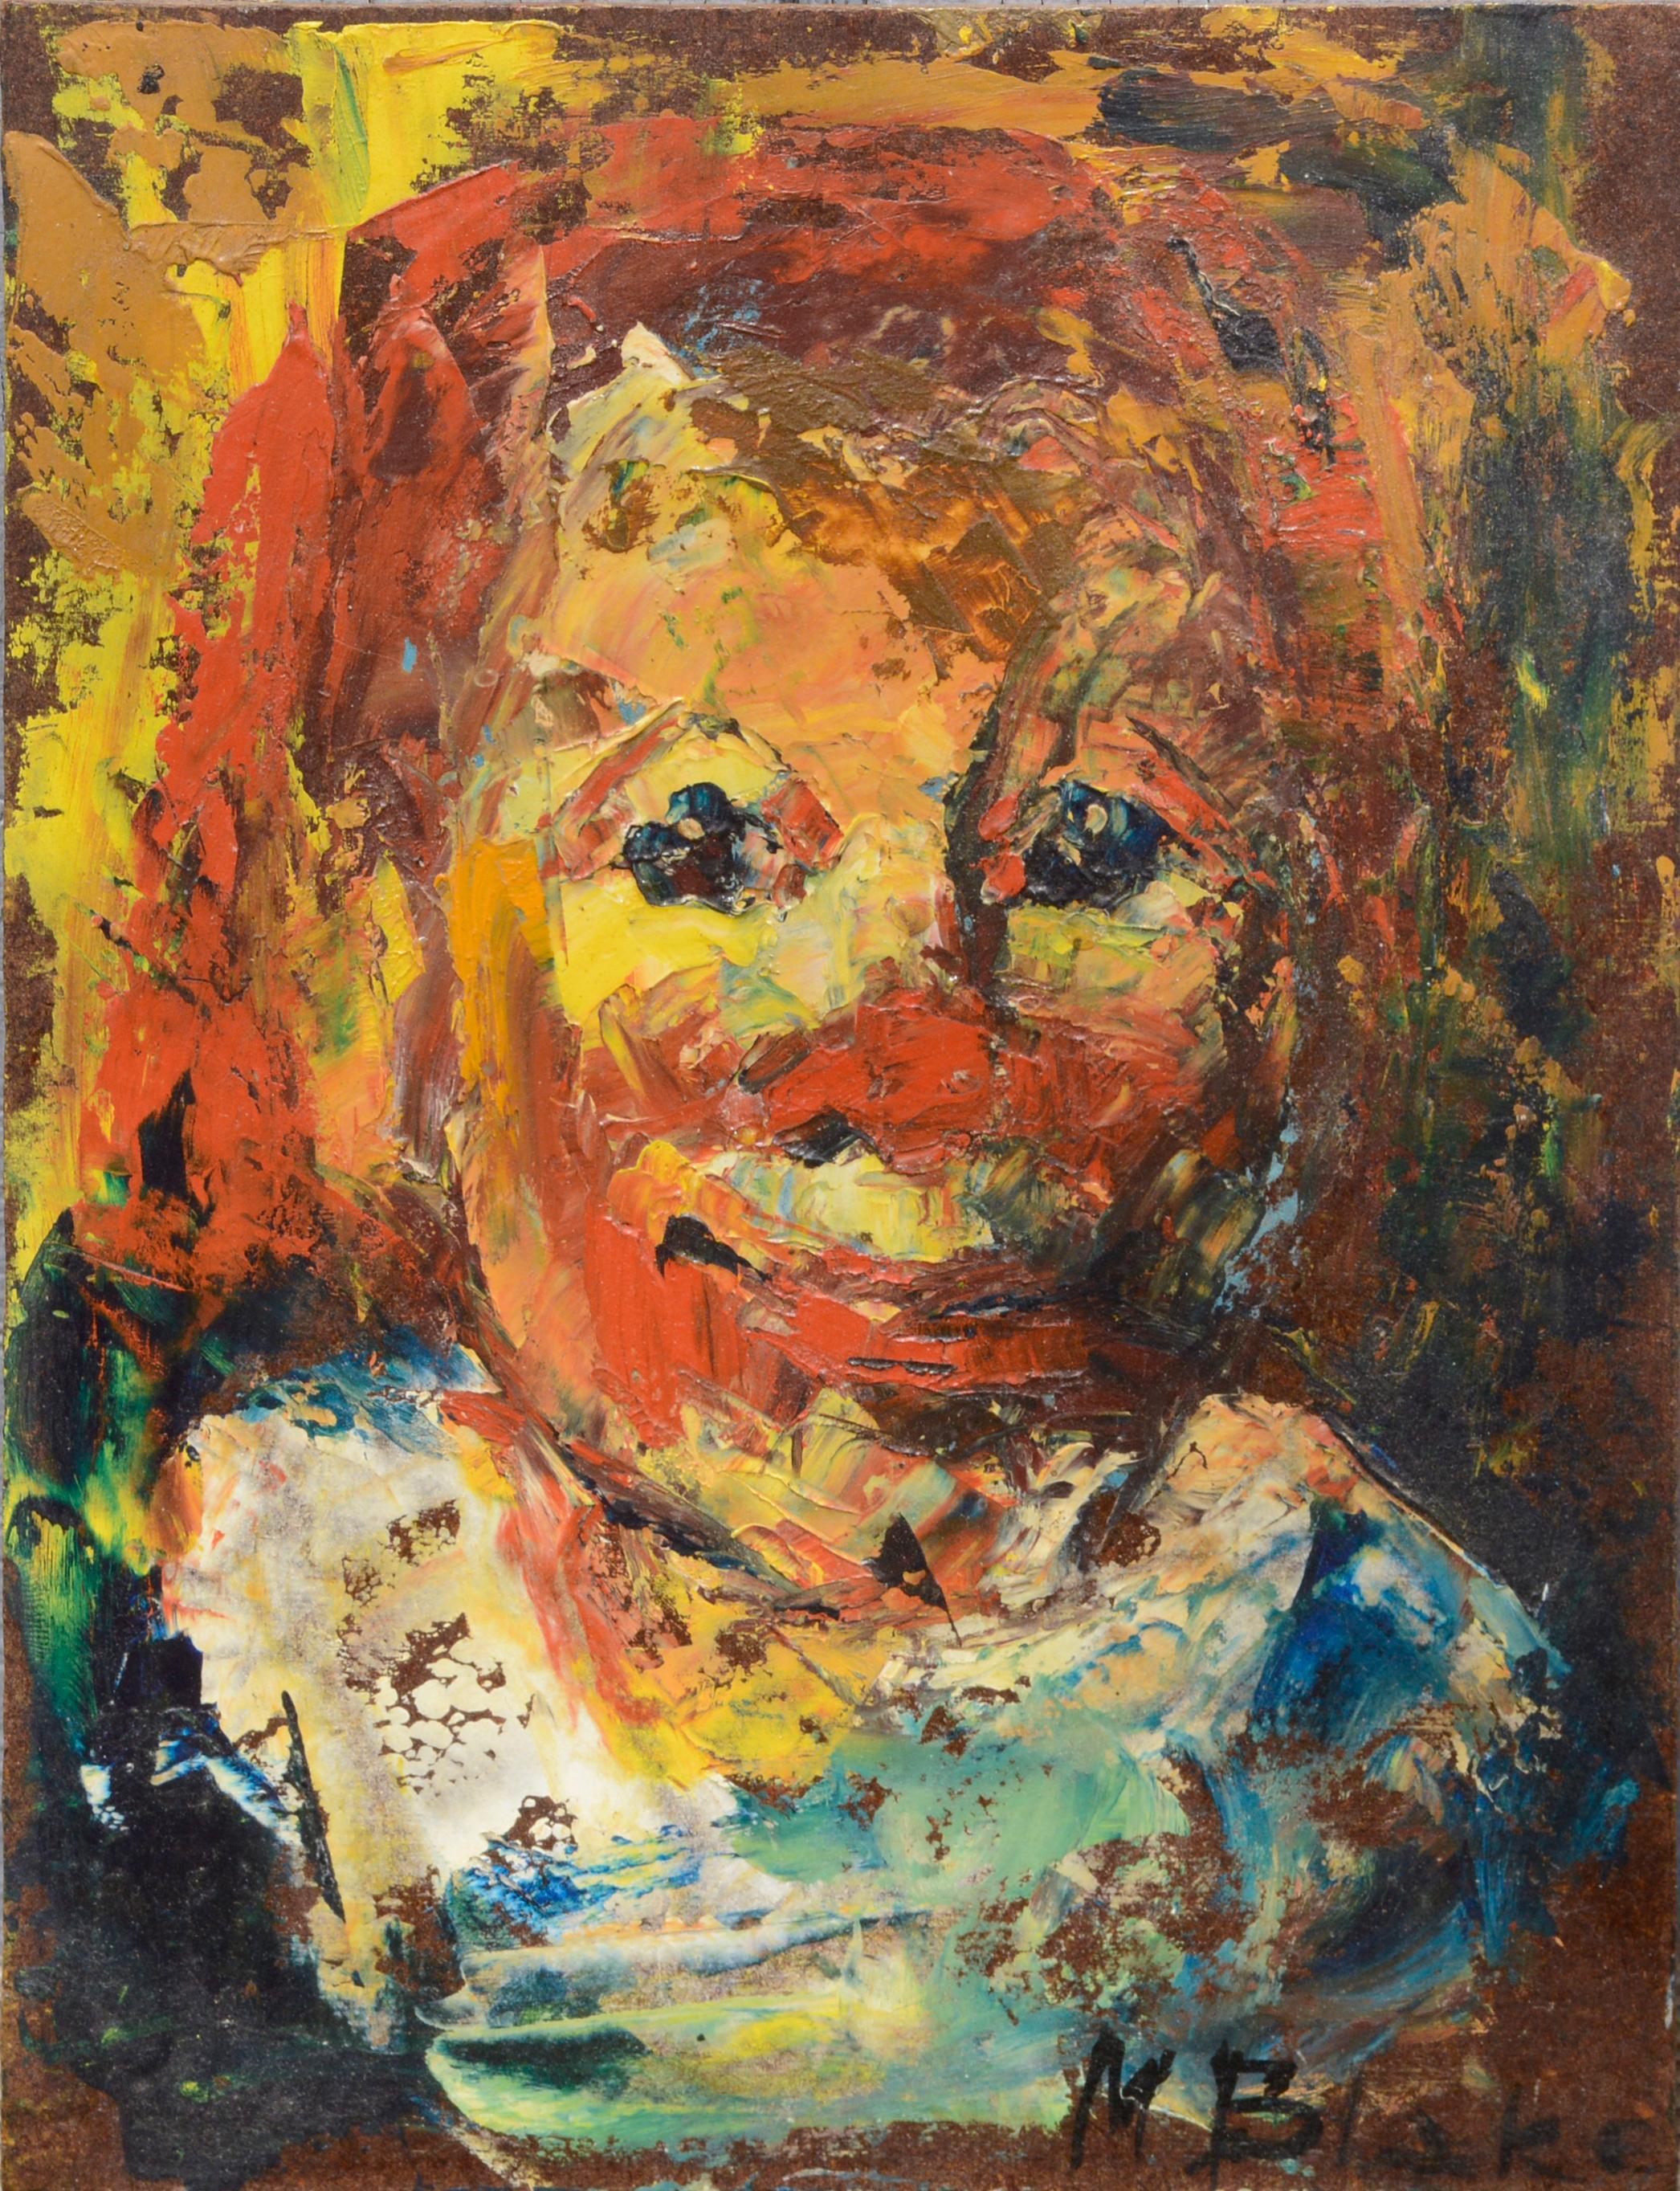 Small Expressionist Clown Portrait #2, 1960s